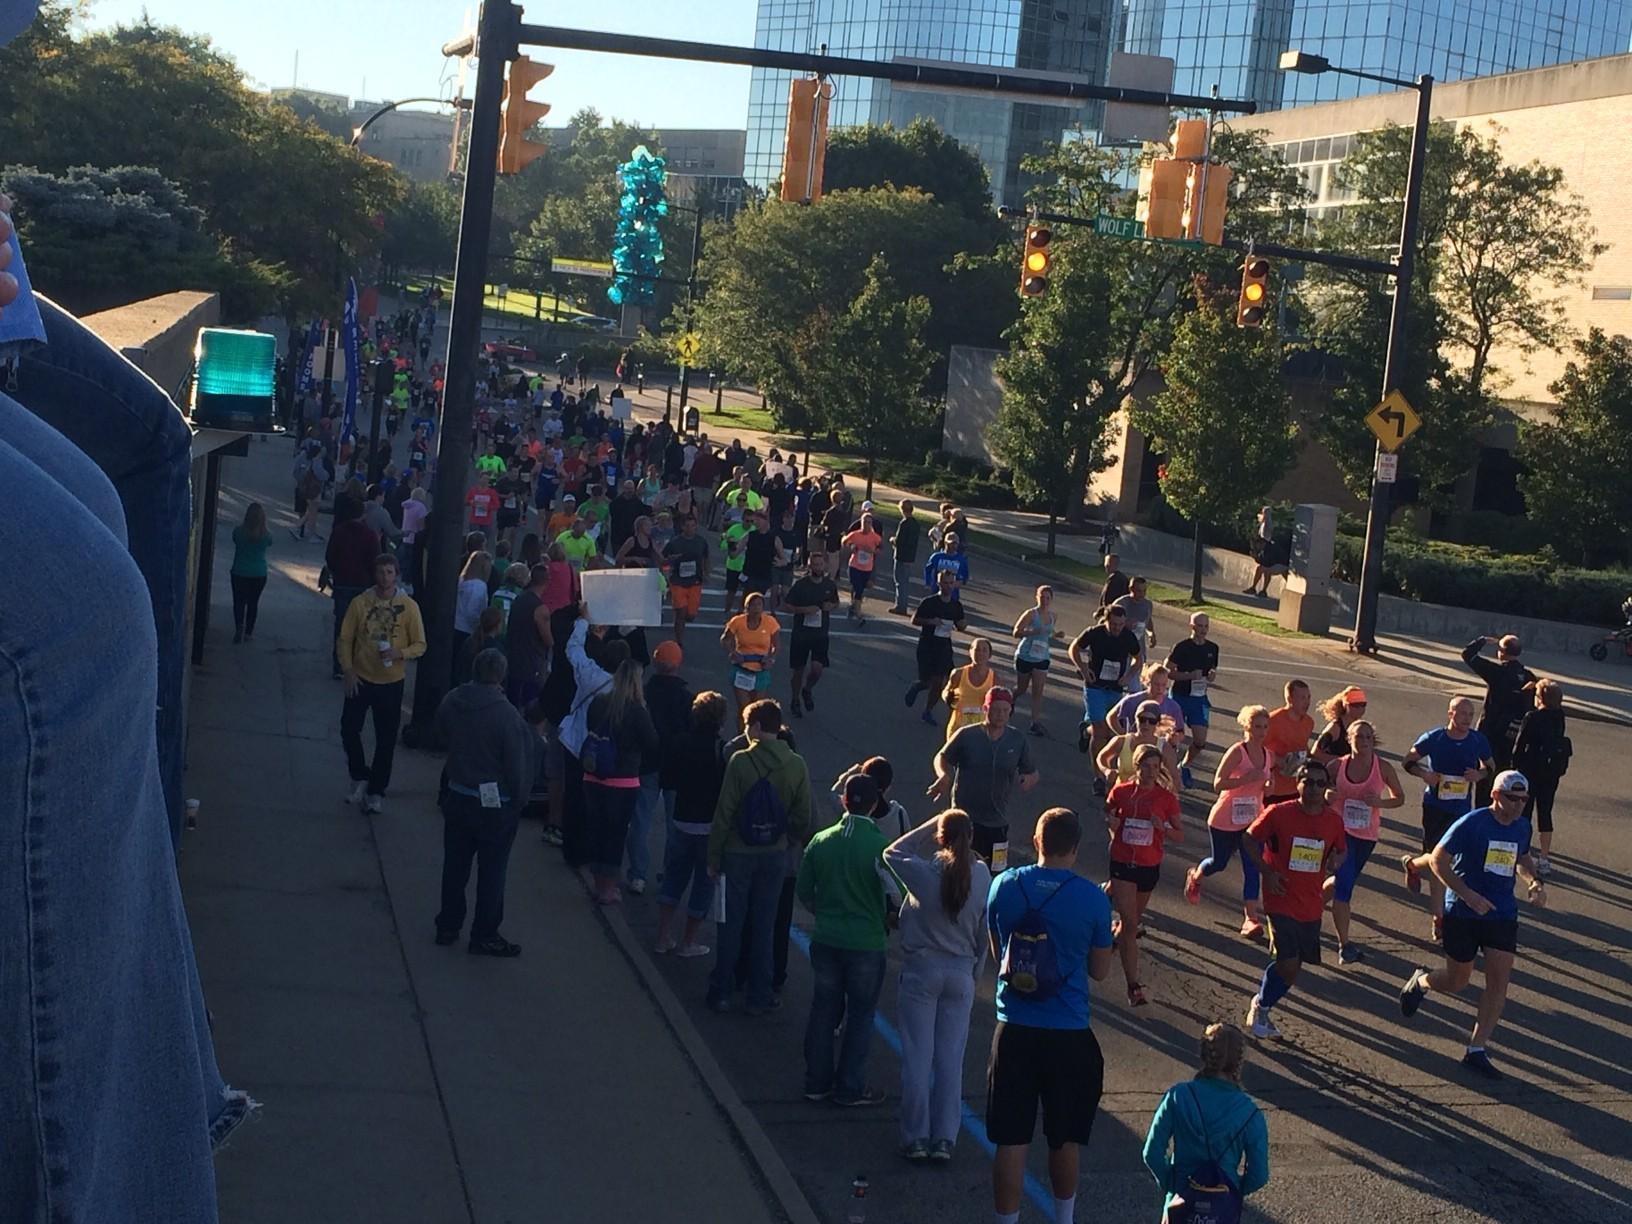 Marathoners cross mile marker 9.7 of the 26.2 miles